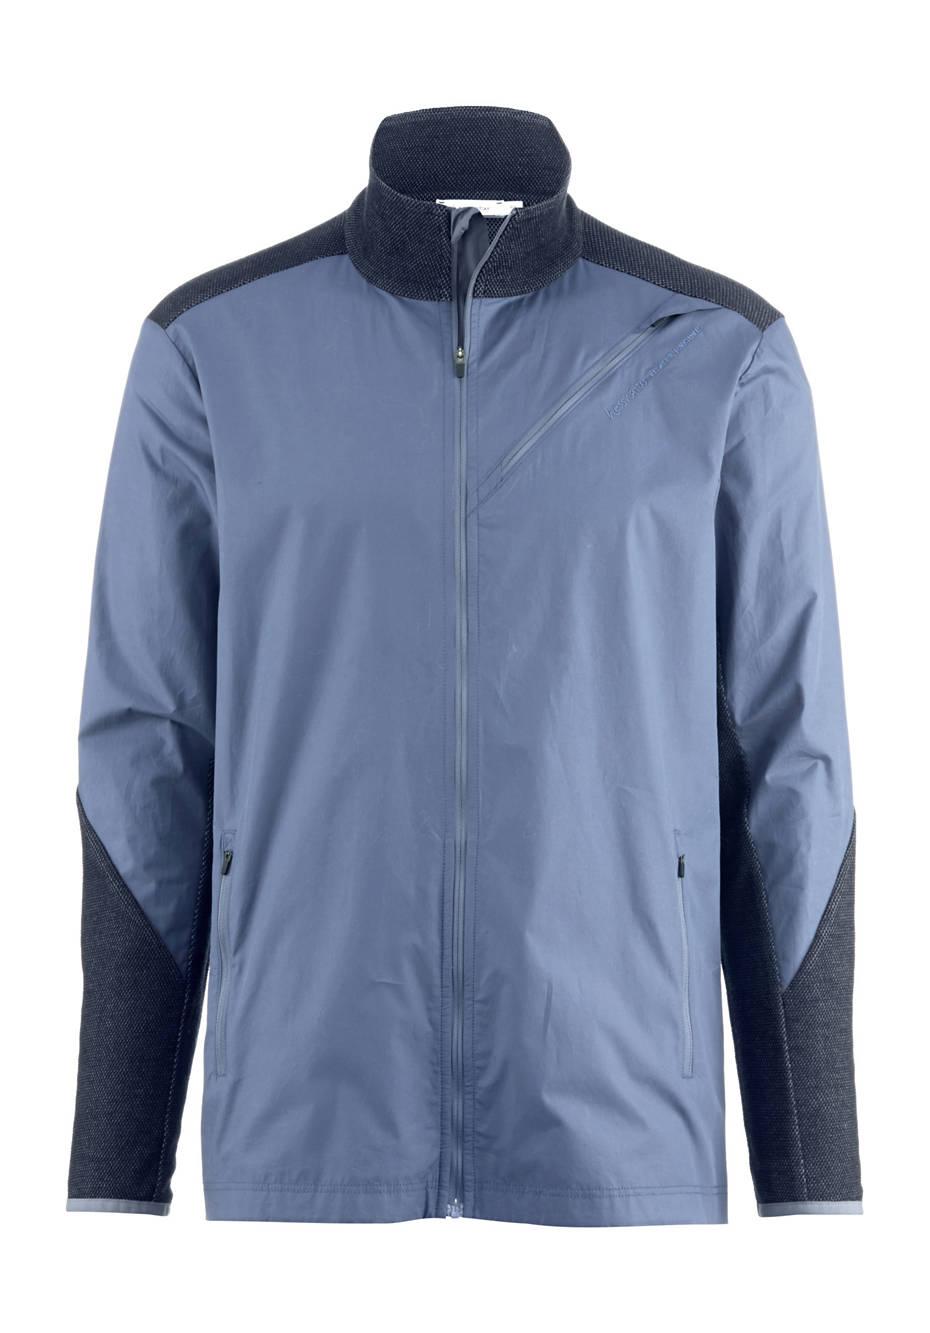 Functional jacket made of organic merino wool with organic cotton